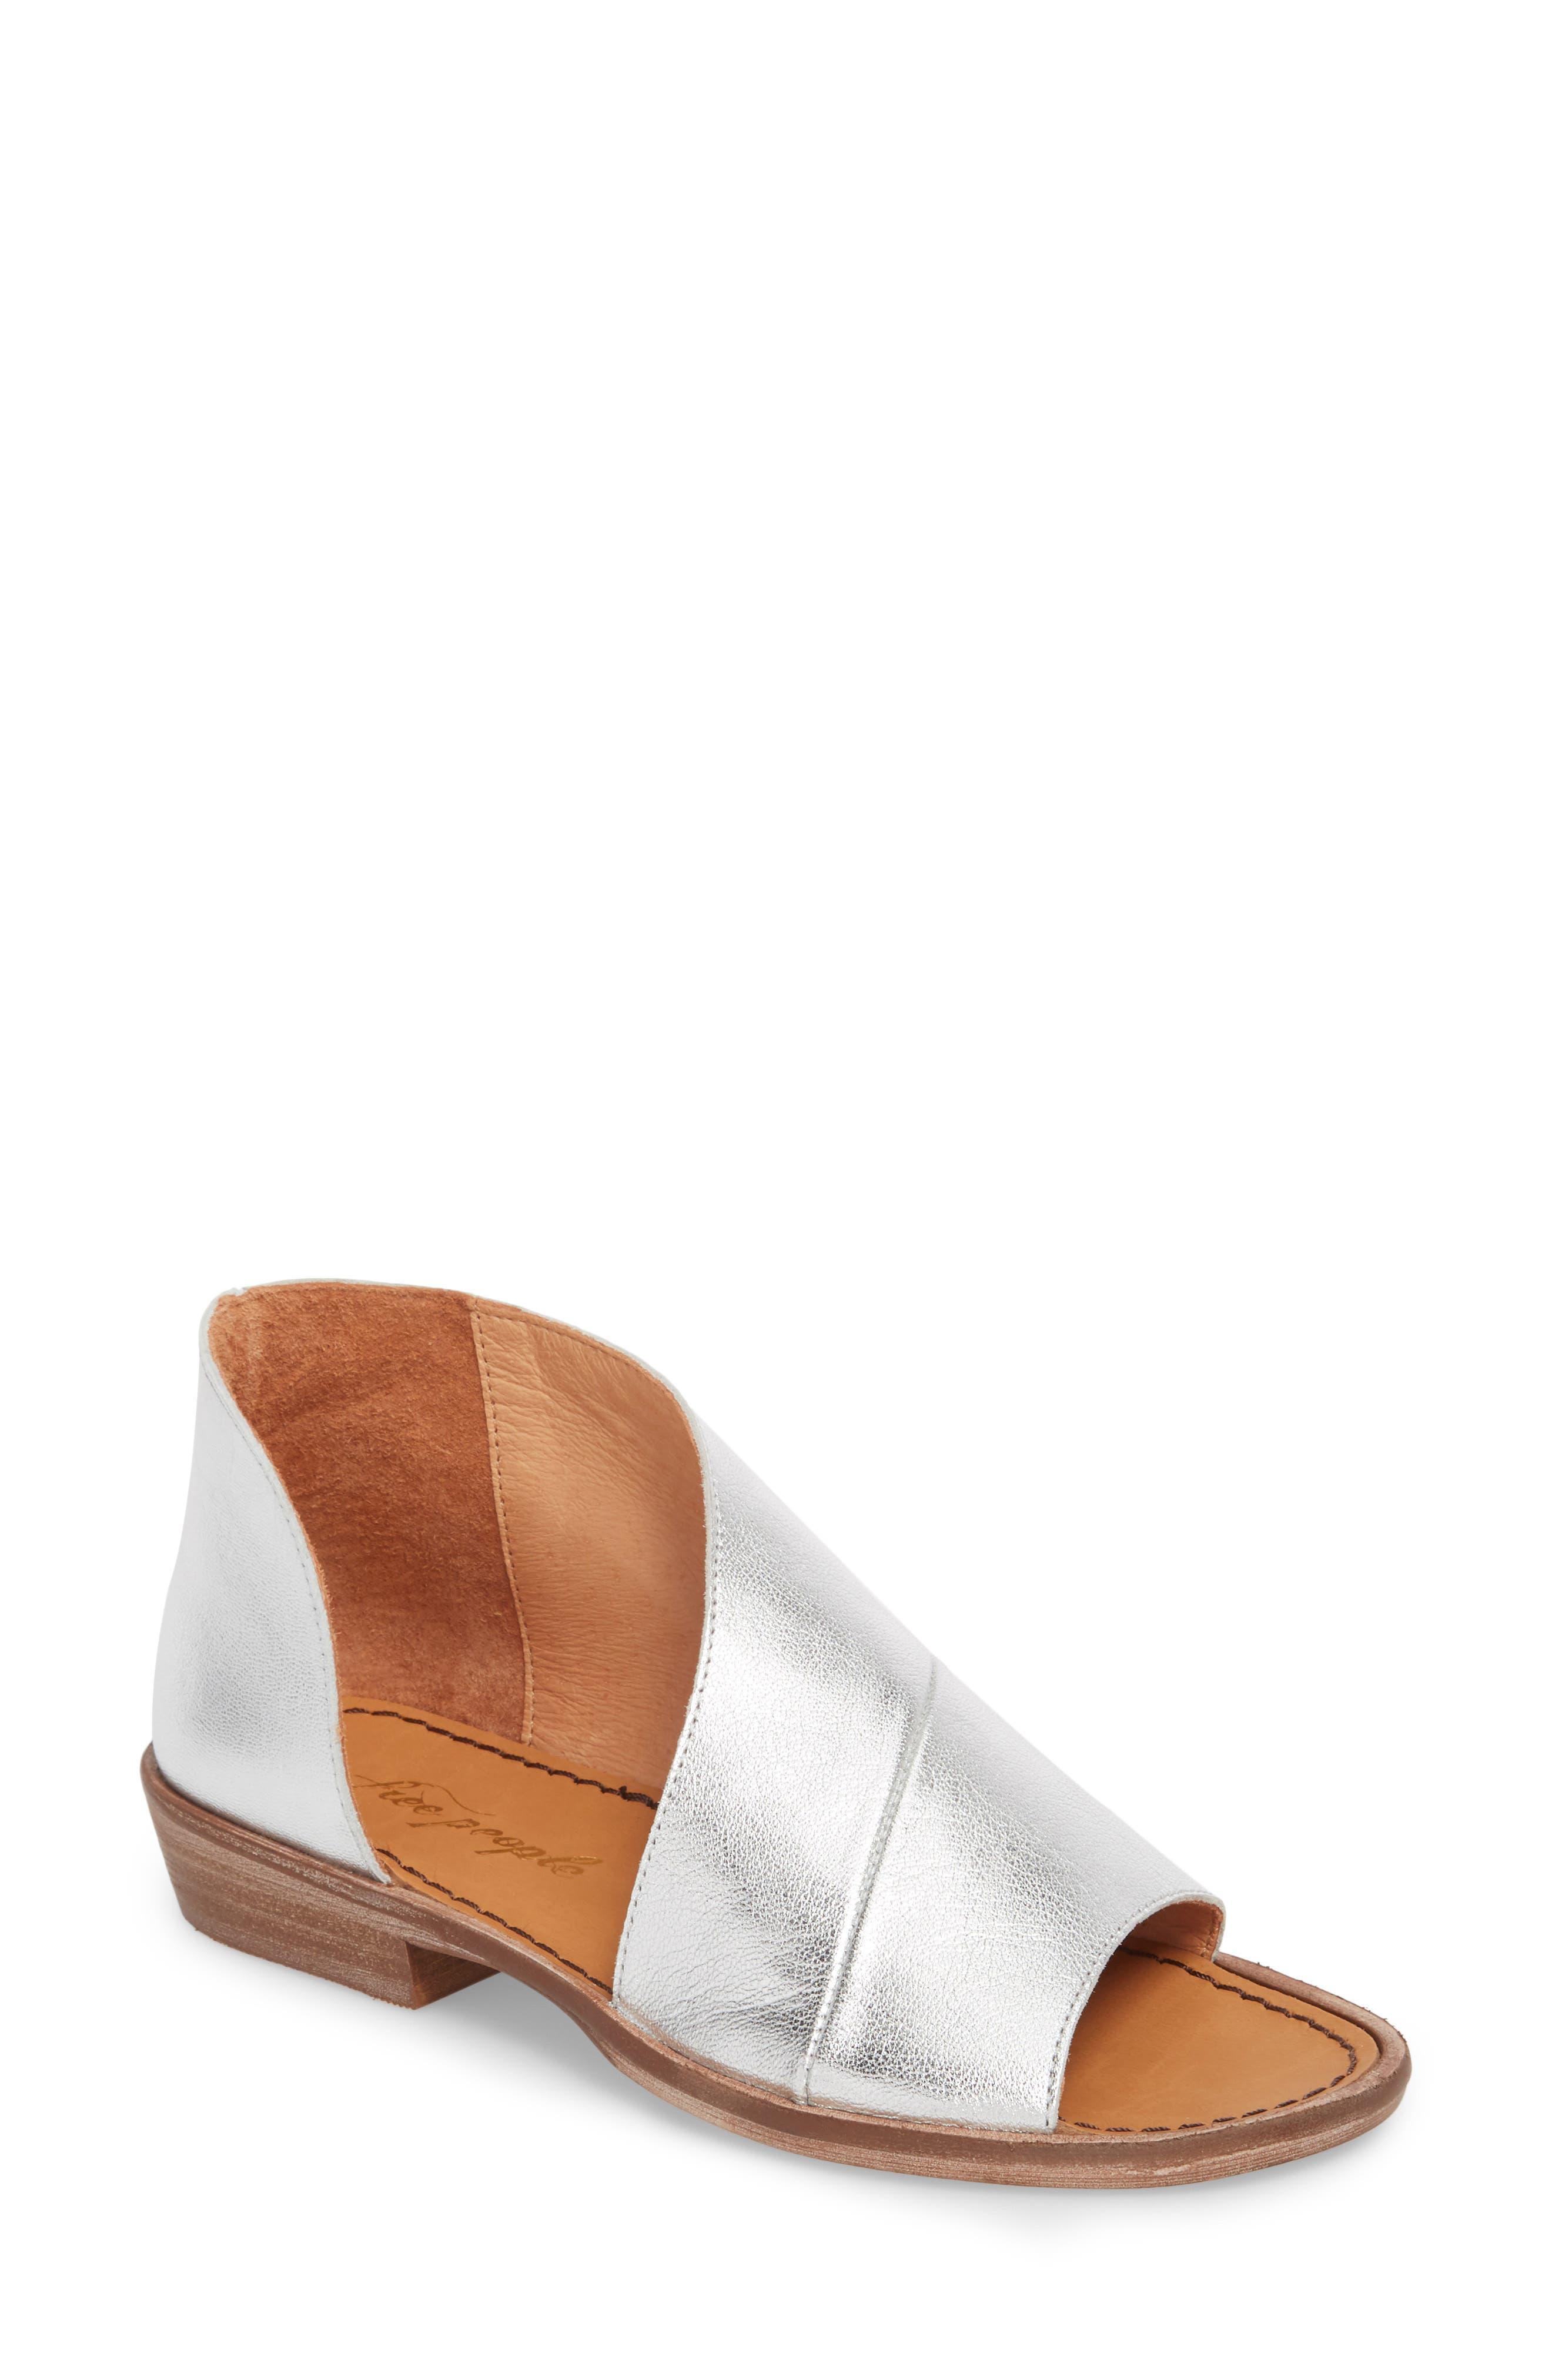 'Mont Blanc' Asymmetrical Sandal,                             Main thumbnail 2, color,